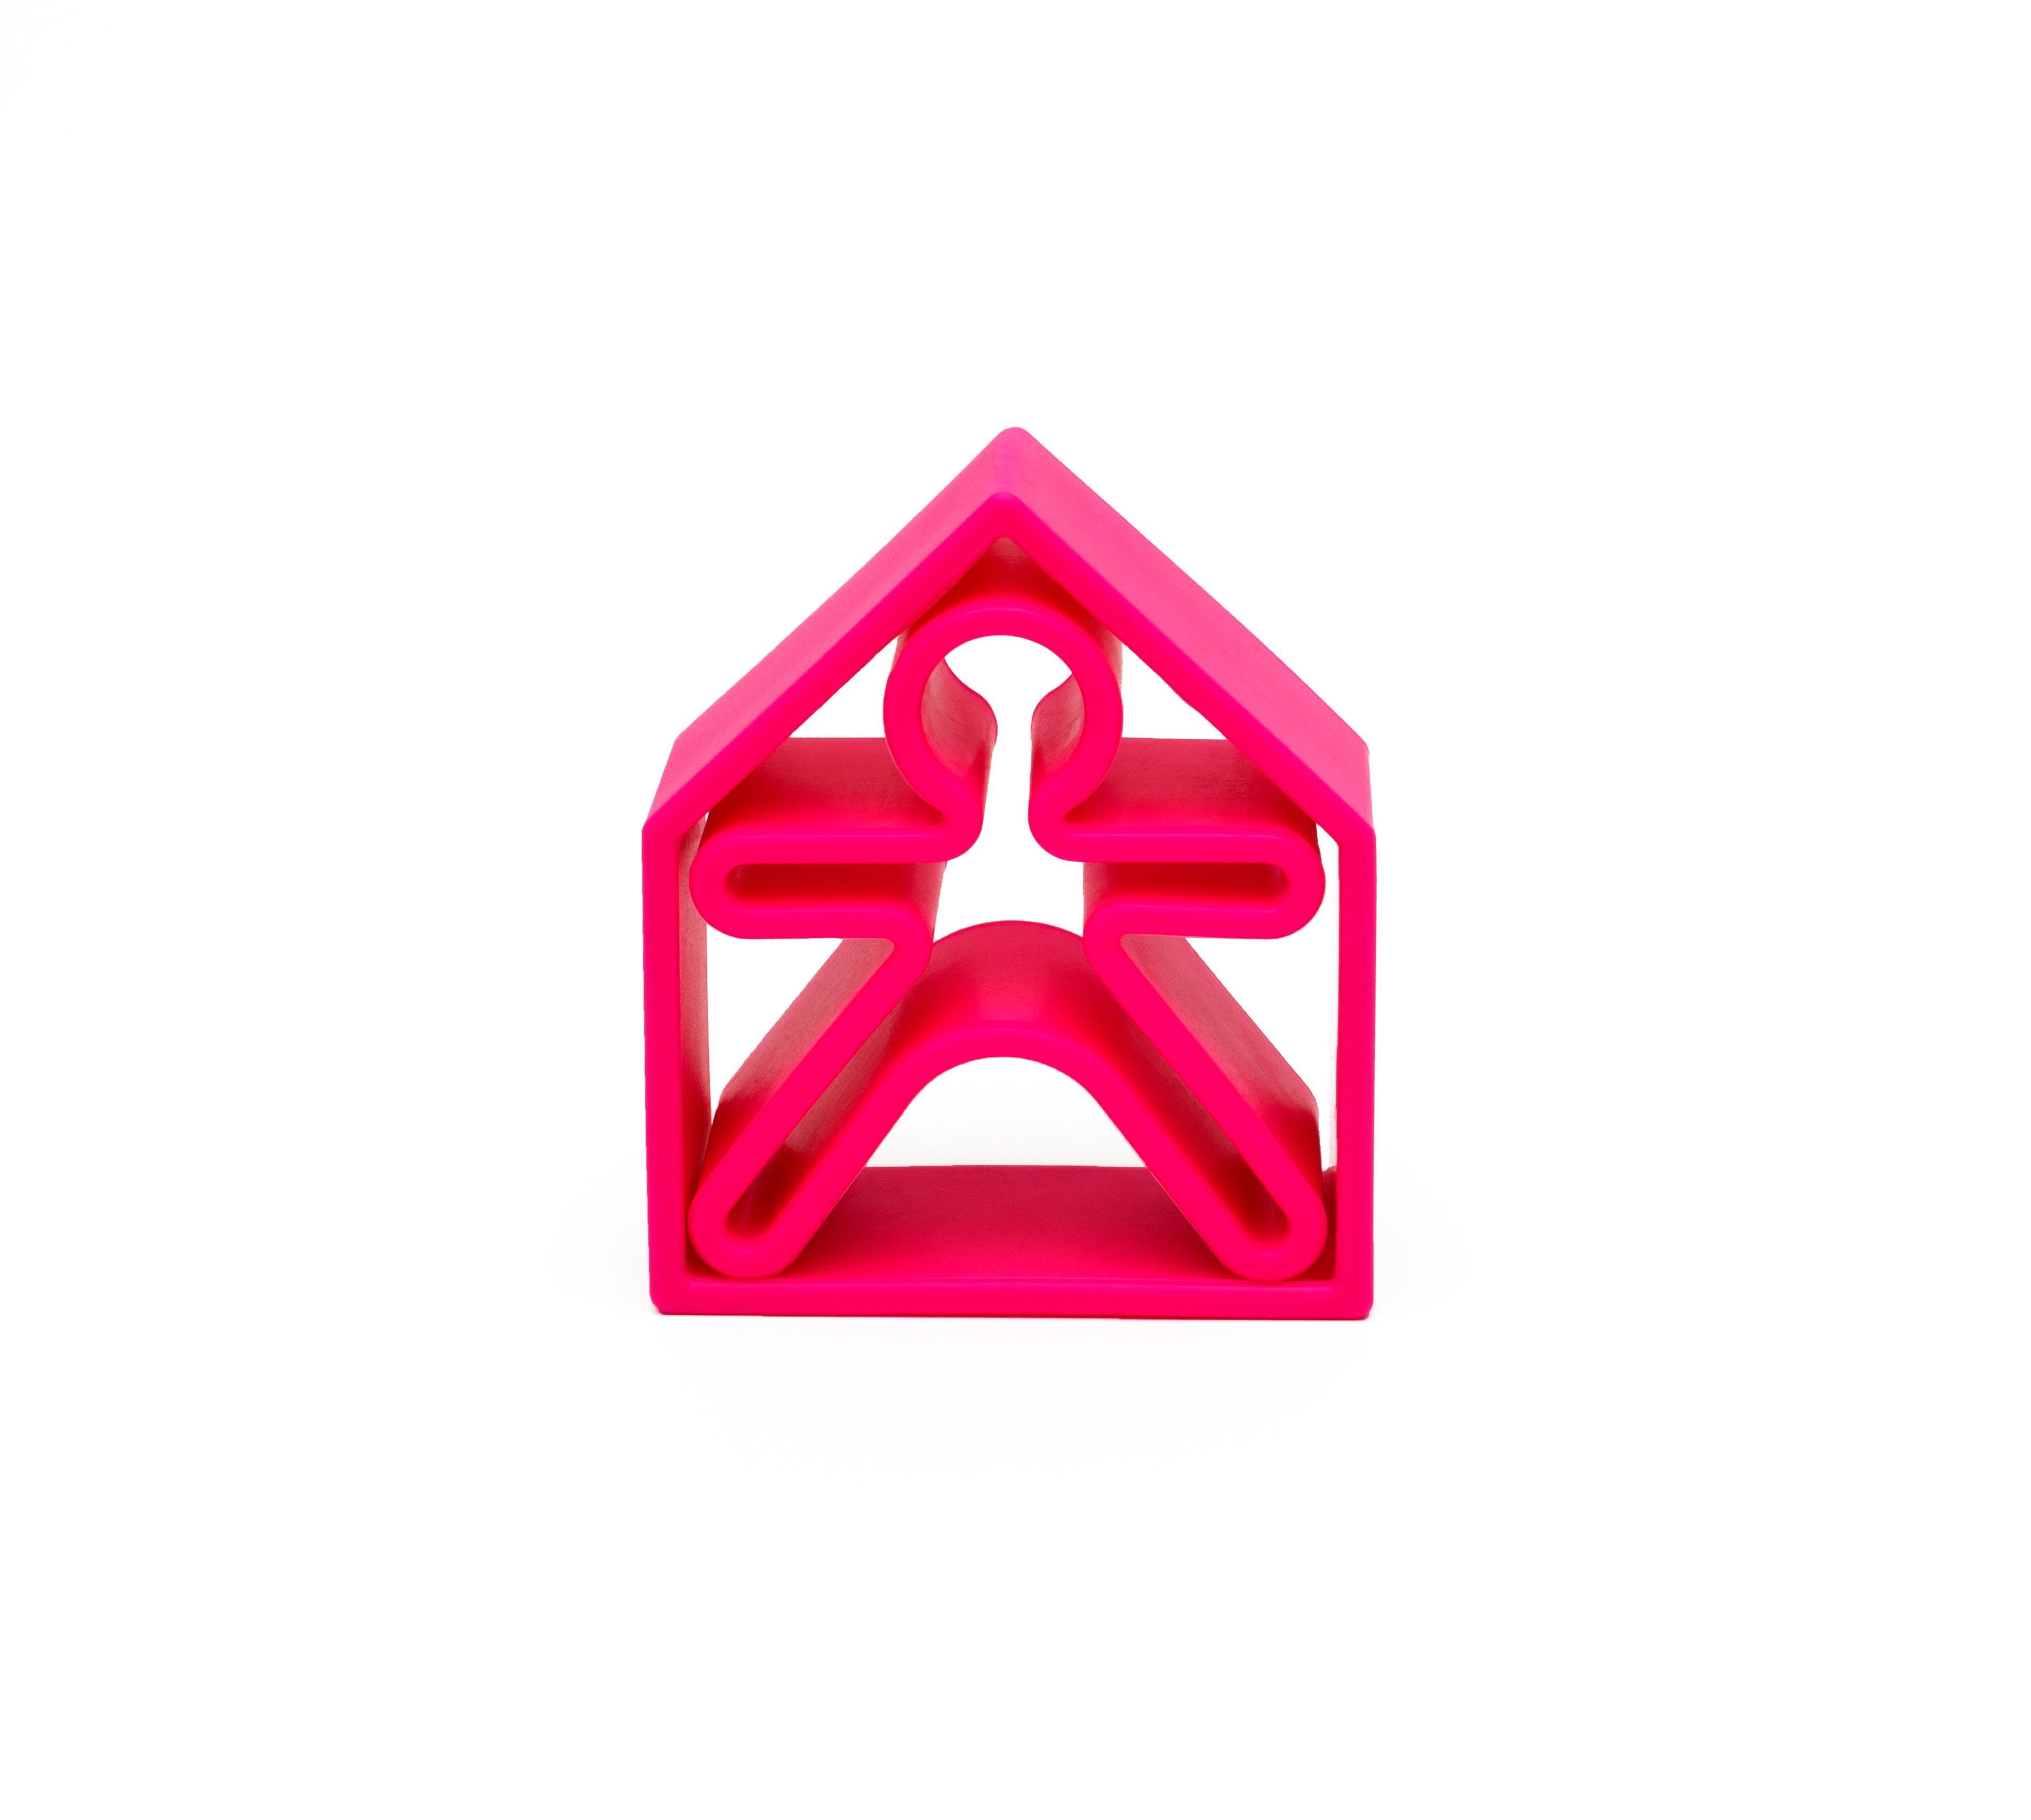 Dena - 1 Kid + 1 House Violet Neon